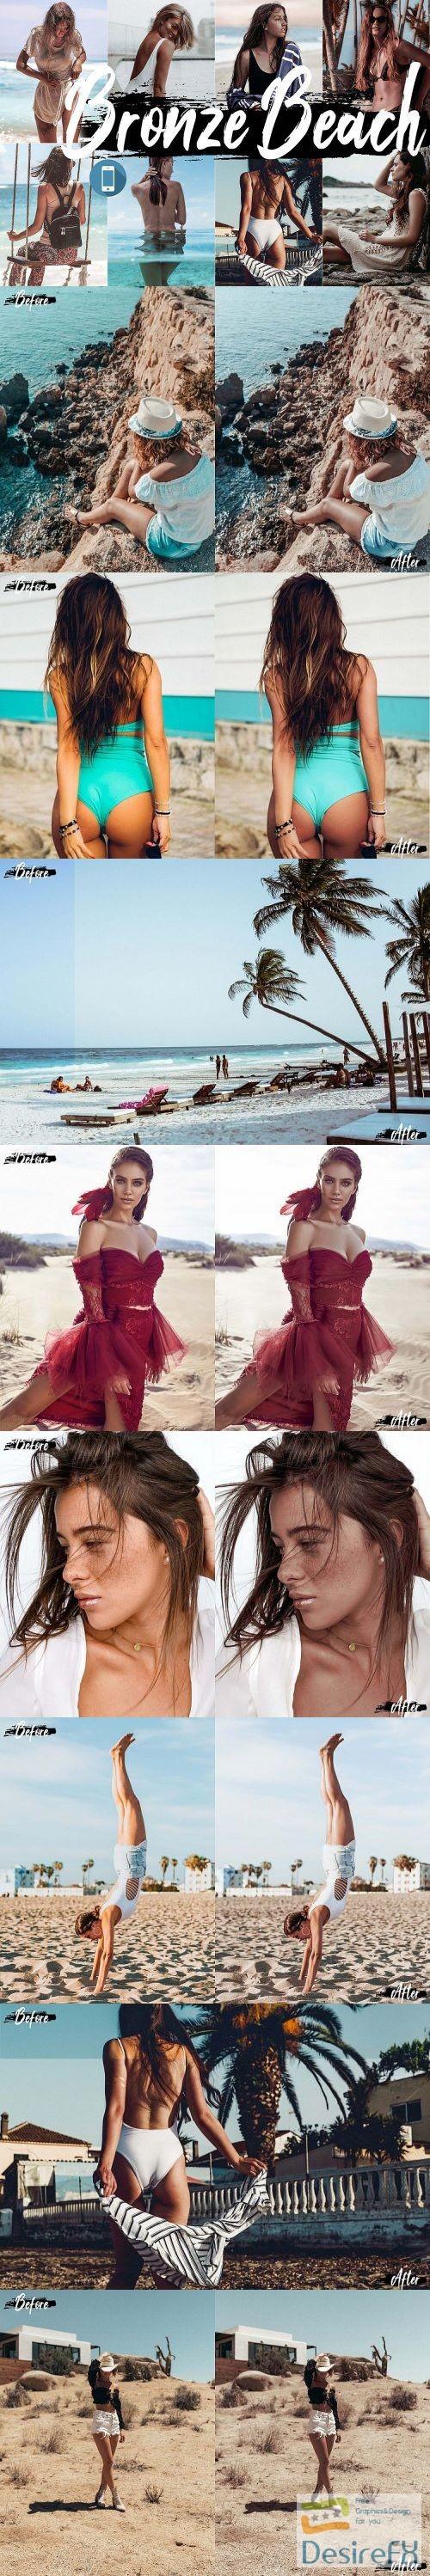 photoshop - Neo bronze Beach Theme mobile lightroom presets summer tone - 272495